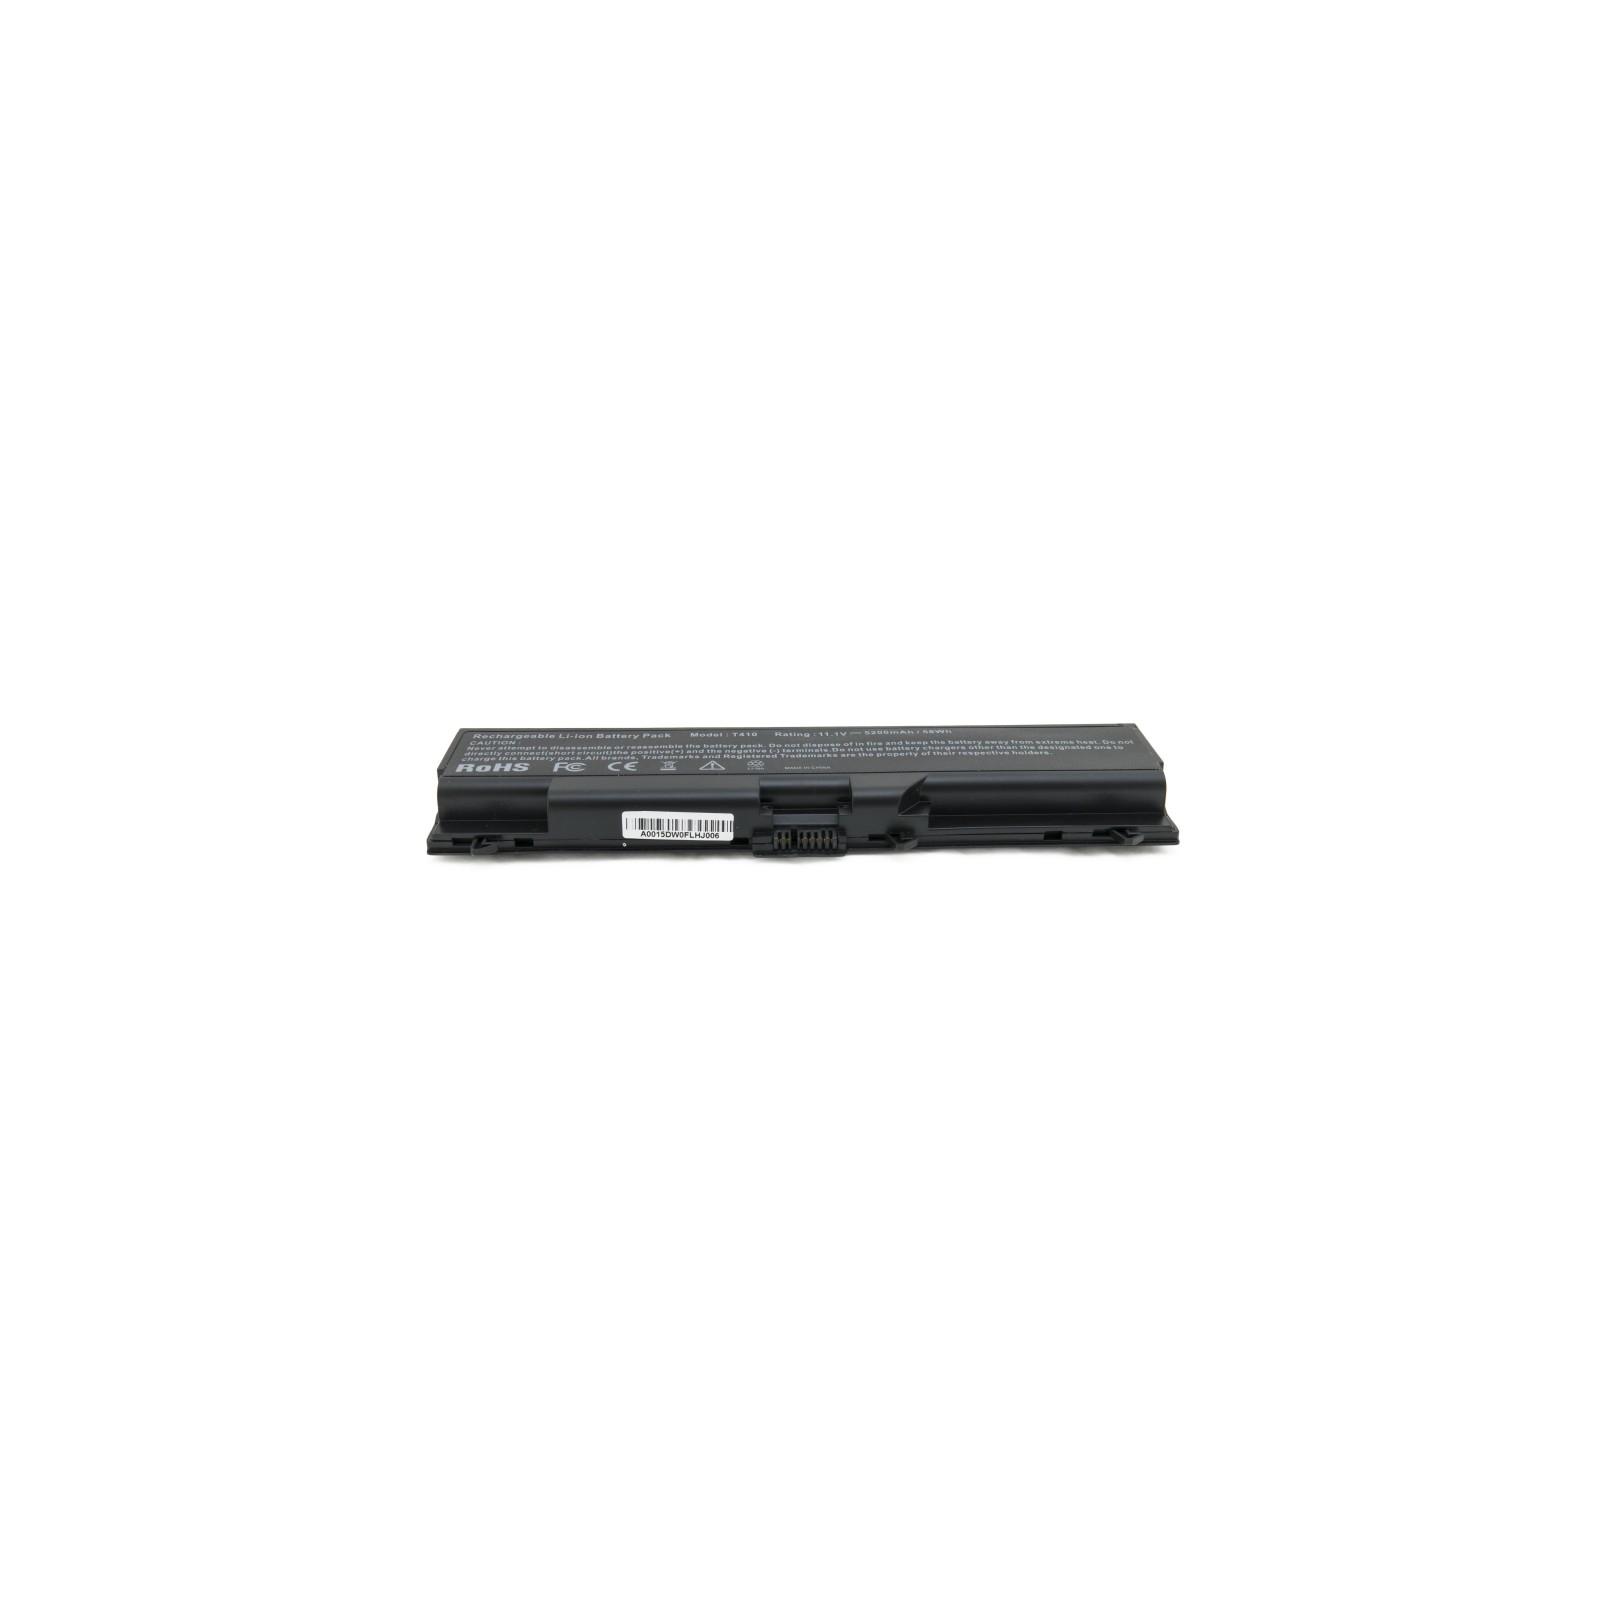 Аккумулятор для ноутбука Lenovo ThinkPad T410, 5200 mAh EXTRADIGITAL (BNL3950) изображение 4